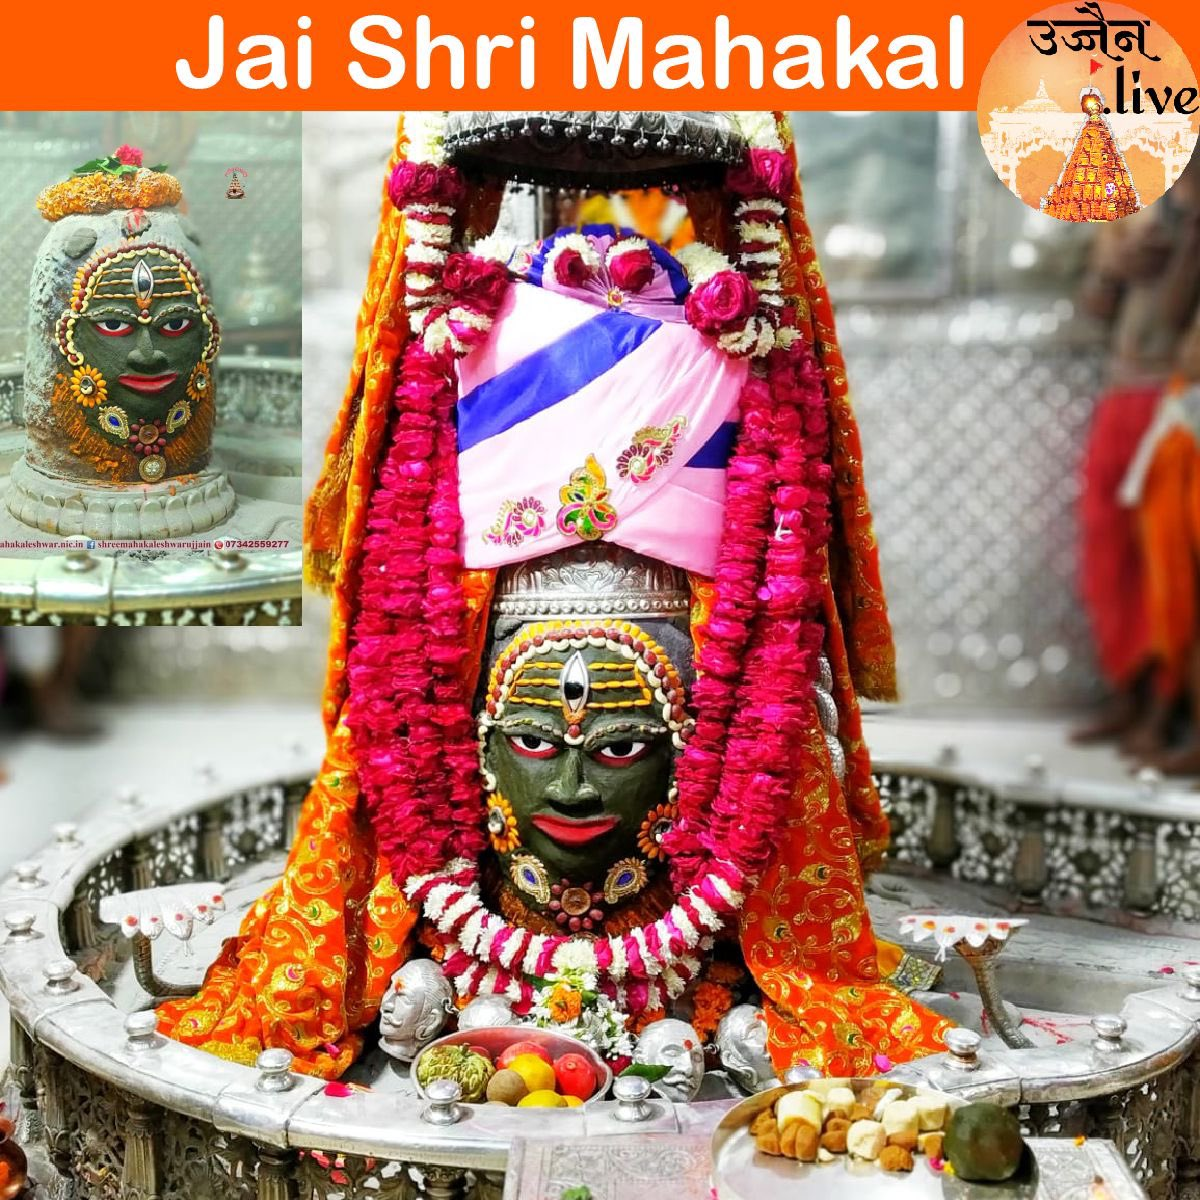 Nov 27:  Bhasma Aarti darshan of Shree #Mahakaleshwar #Ujjain #shiv #shiva #bholenath #mahadev #हर_हर_महादेव #jaibholenath #jaimahakal #om #omnamahshivay #harharmahadev  #mahakal #goodmorning #fridayvibes #Incredibleindia  @HinduTempleLive @BharatTemples_ https://t.co/MpkFoaXPQ6